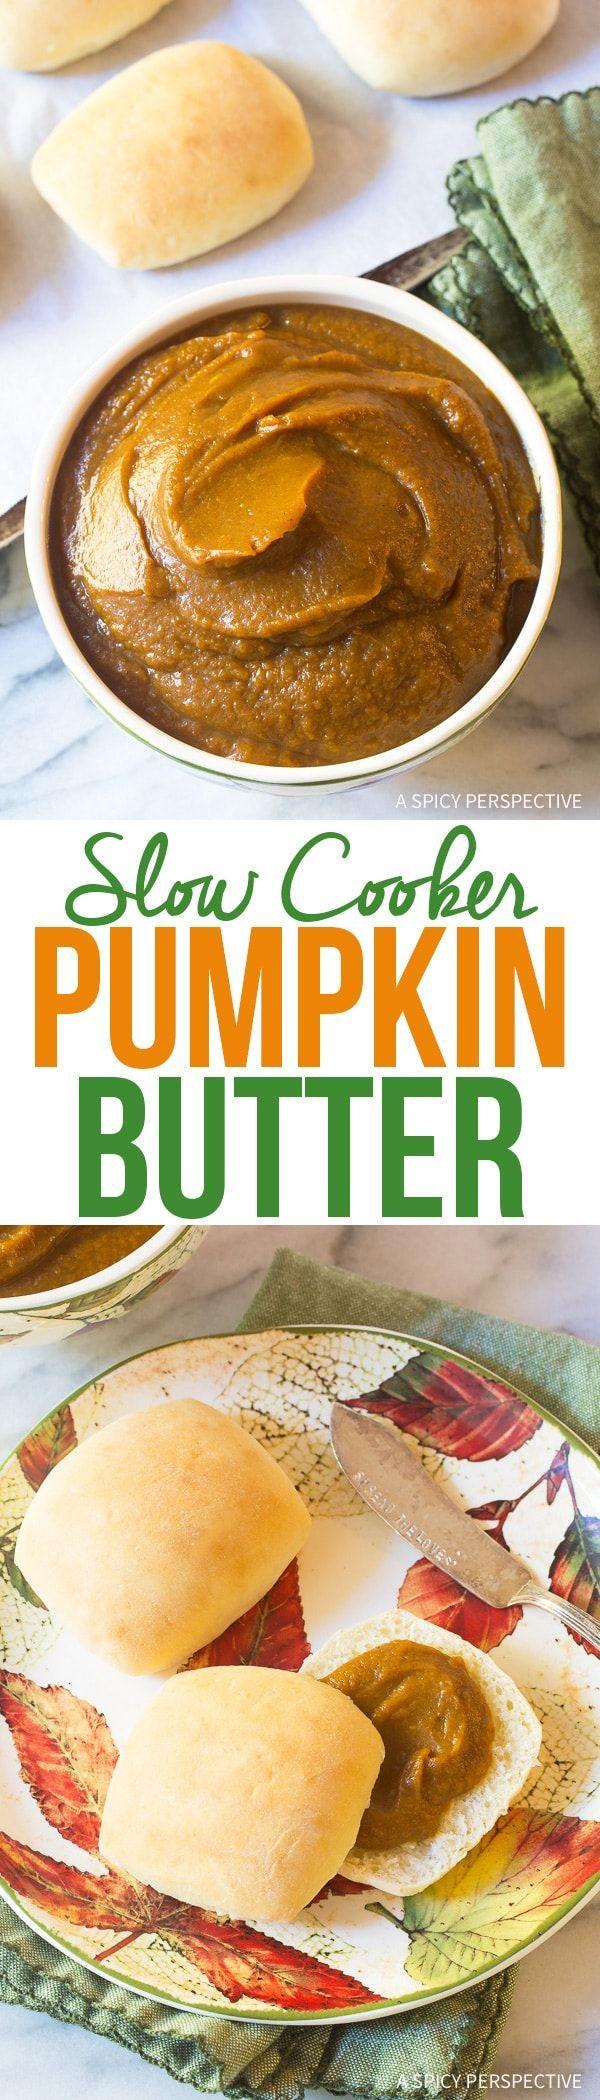 Slow Cooker Pumpkin Butter Recipe - A simple 6-ingredient spread that tastes delicious on warm Sister Schubert's rolls!  via @spicyperspectiv